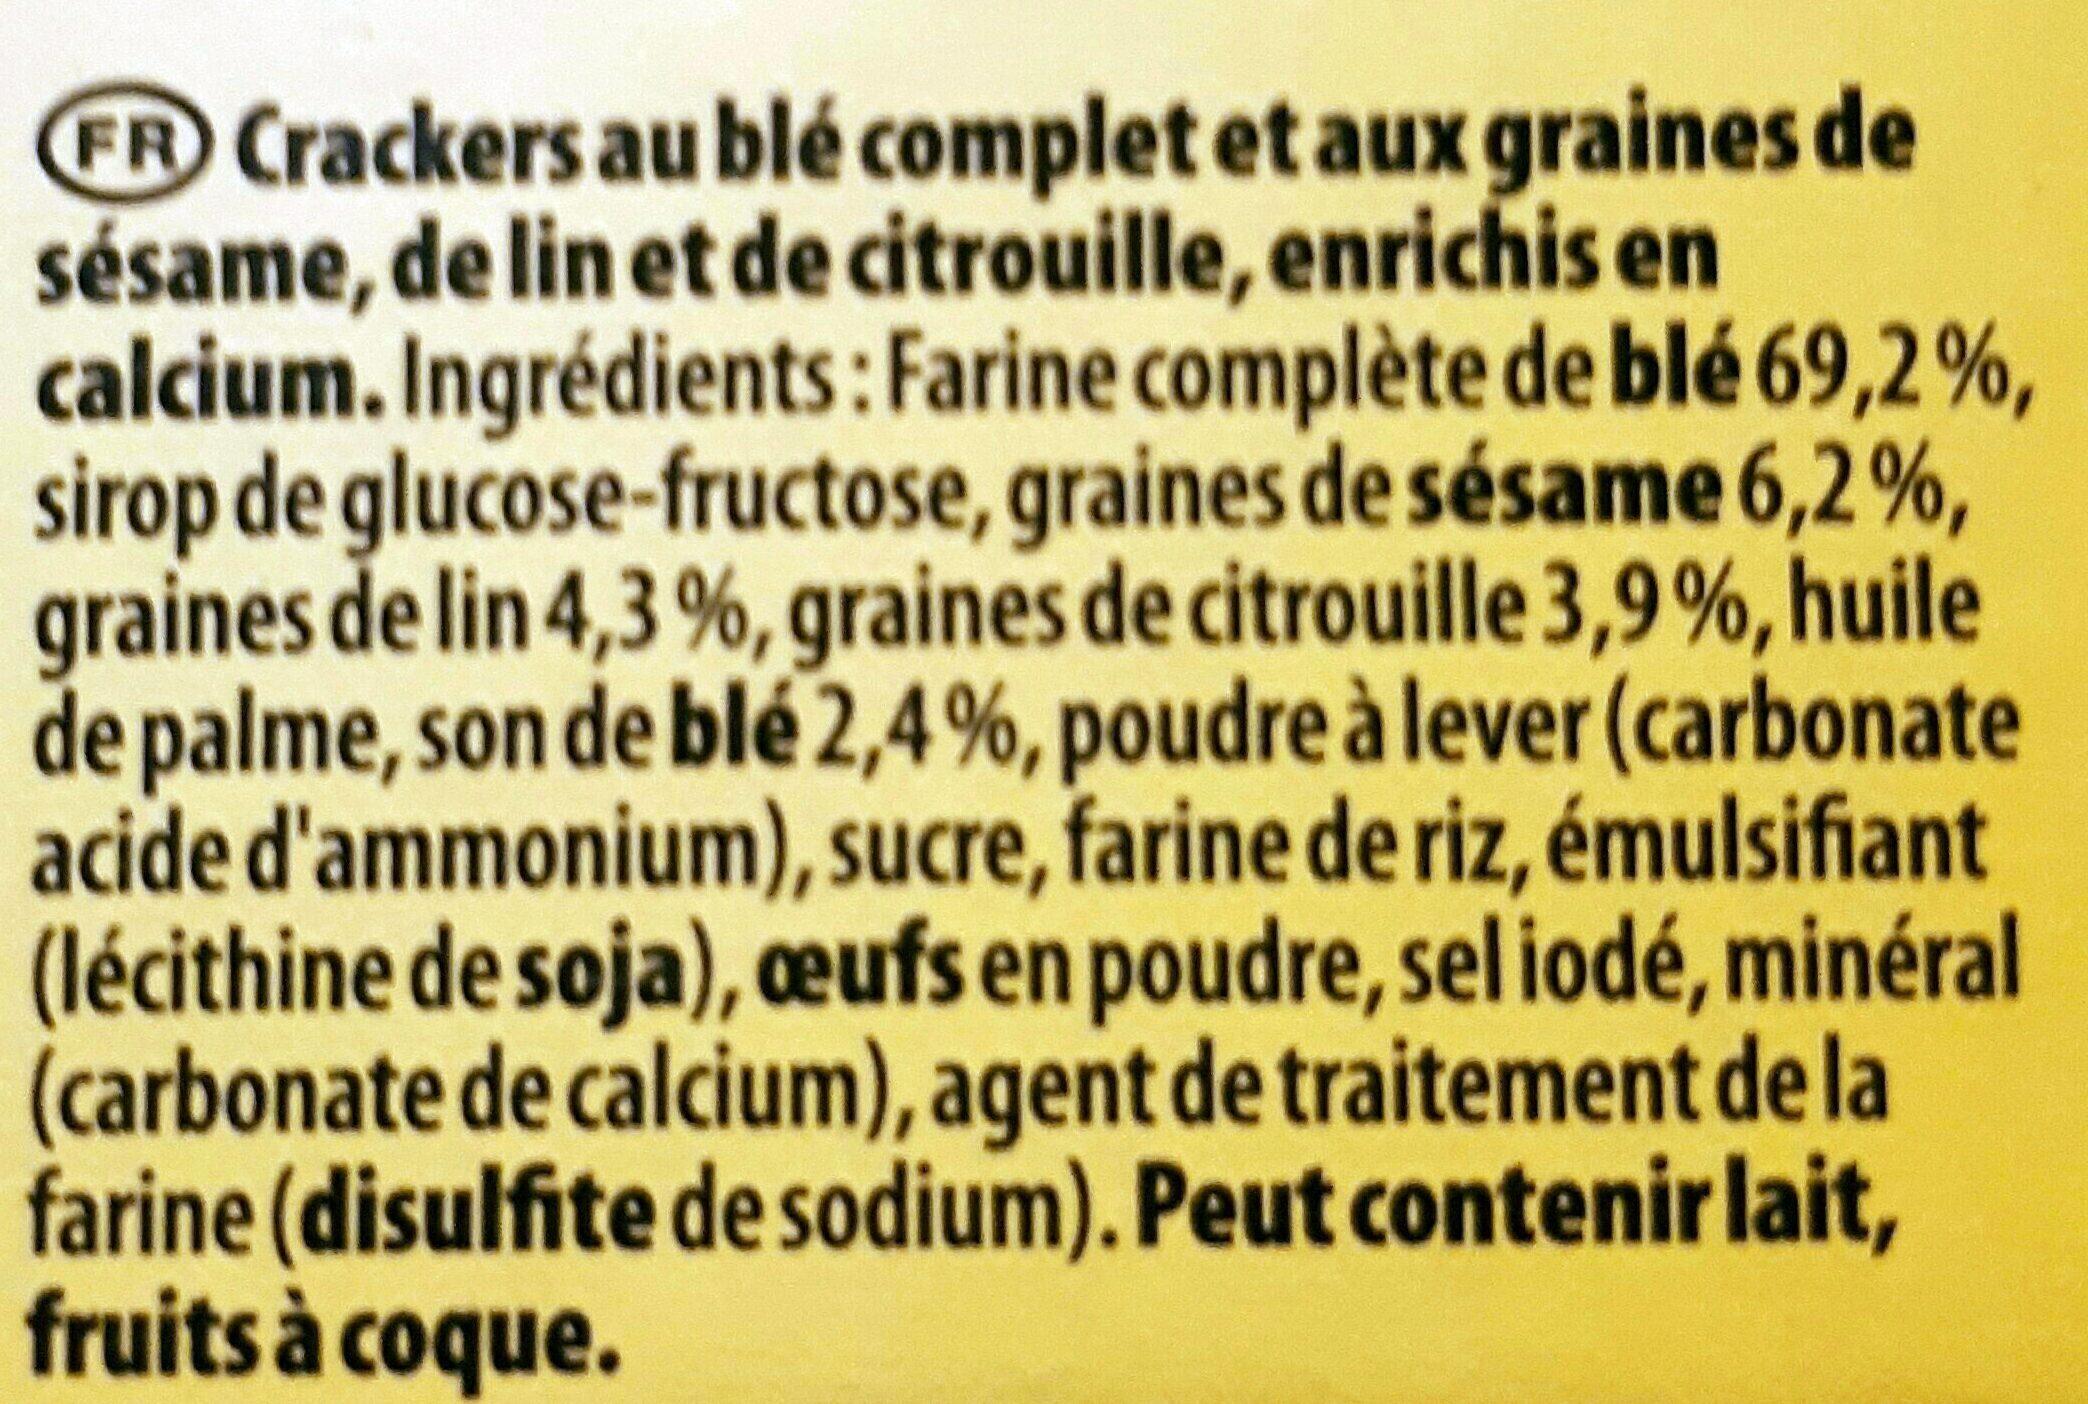 Crackers petit déjeuner multi graines 200 g - Ingredients